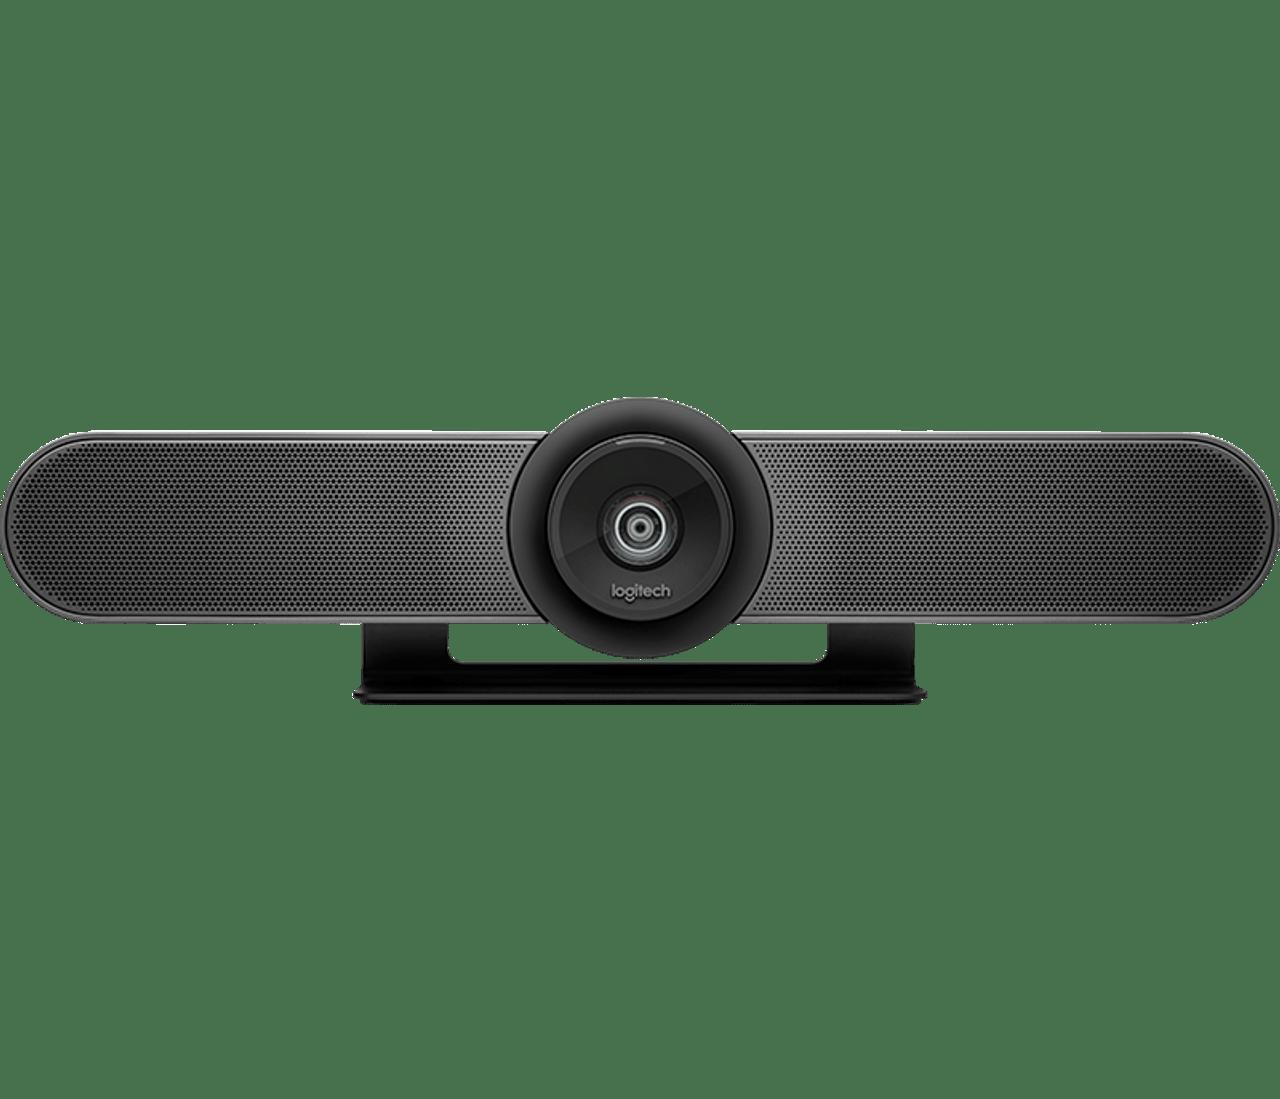 6340bd4e392 Logitech MeetUp with Expansion Mic - VideoLink